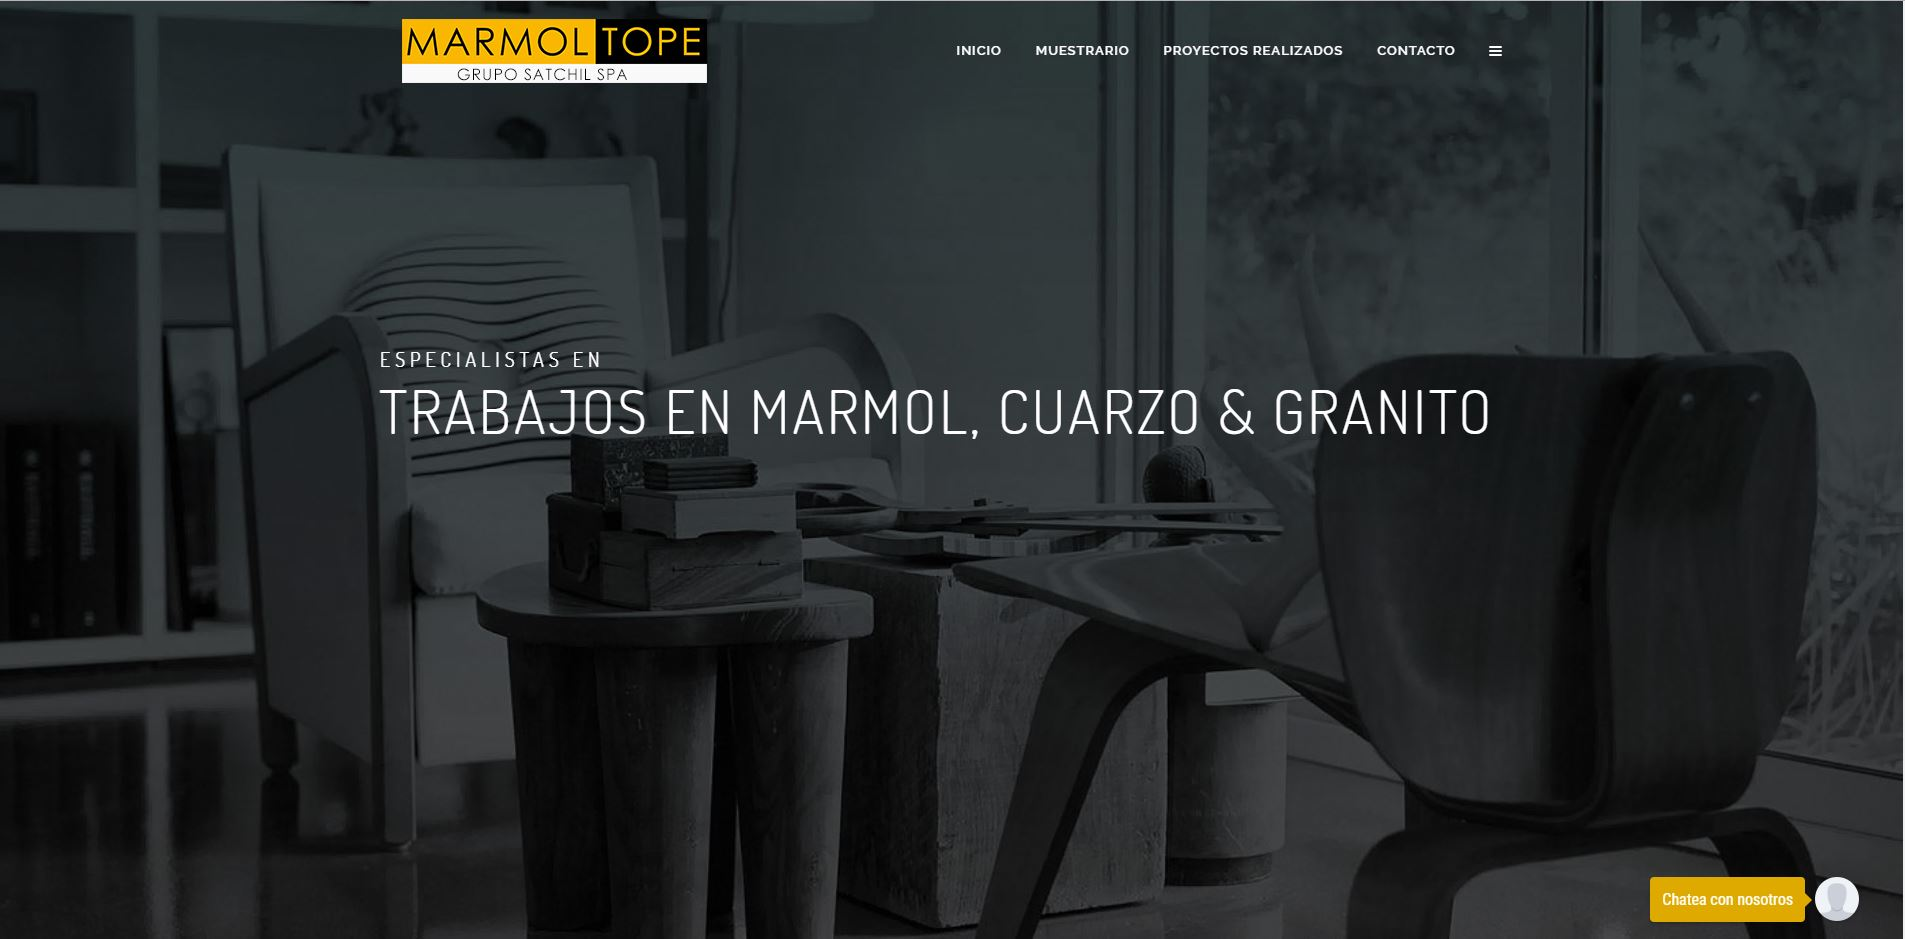 Marmoltope.cl Proceso 1 - Tiweb - Pagina Web Autoadministrable - Posicionamiento Web